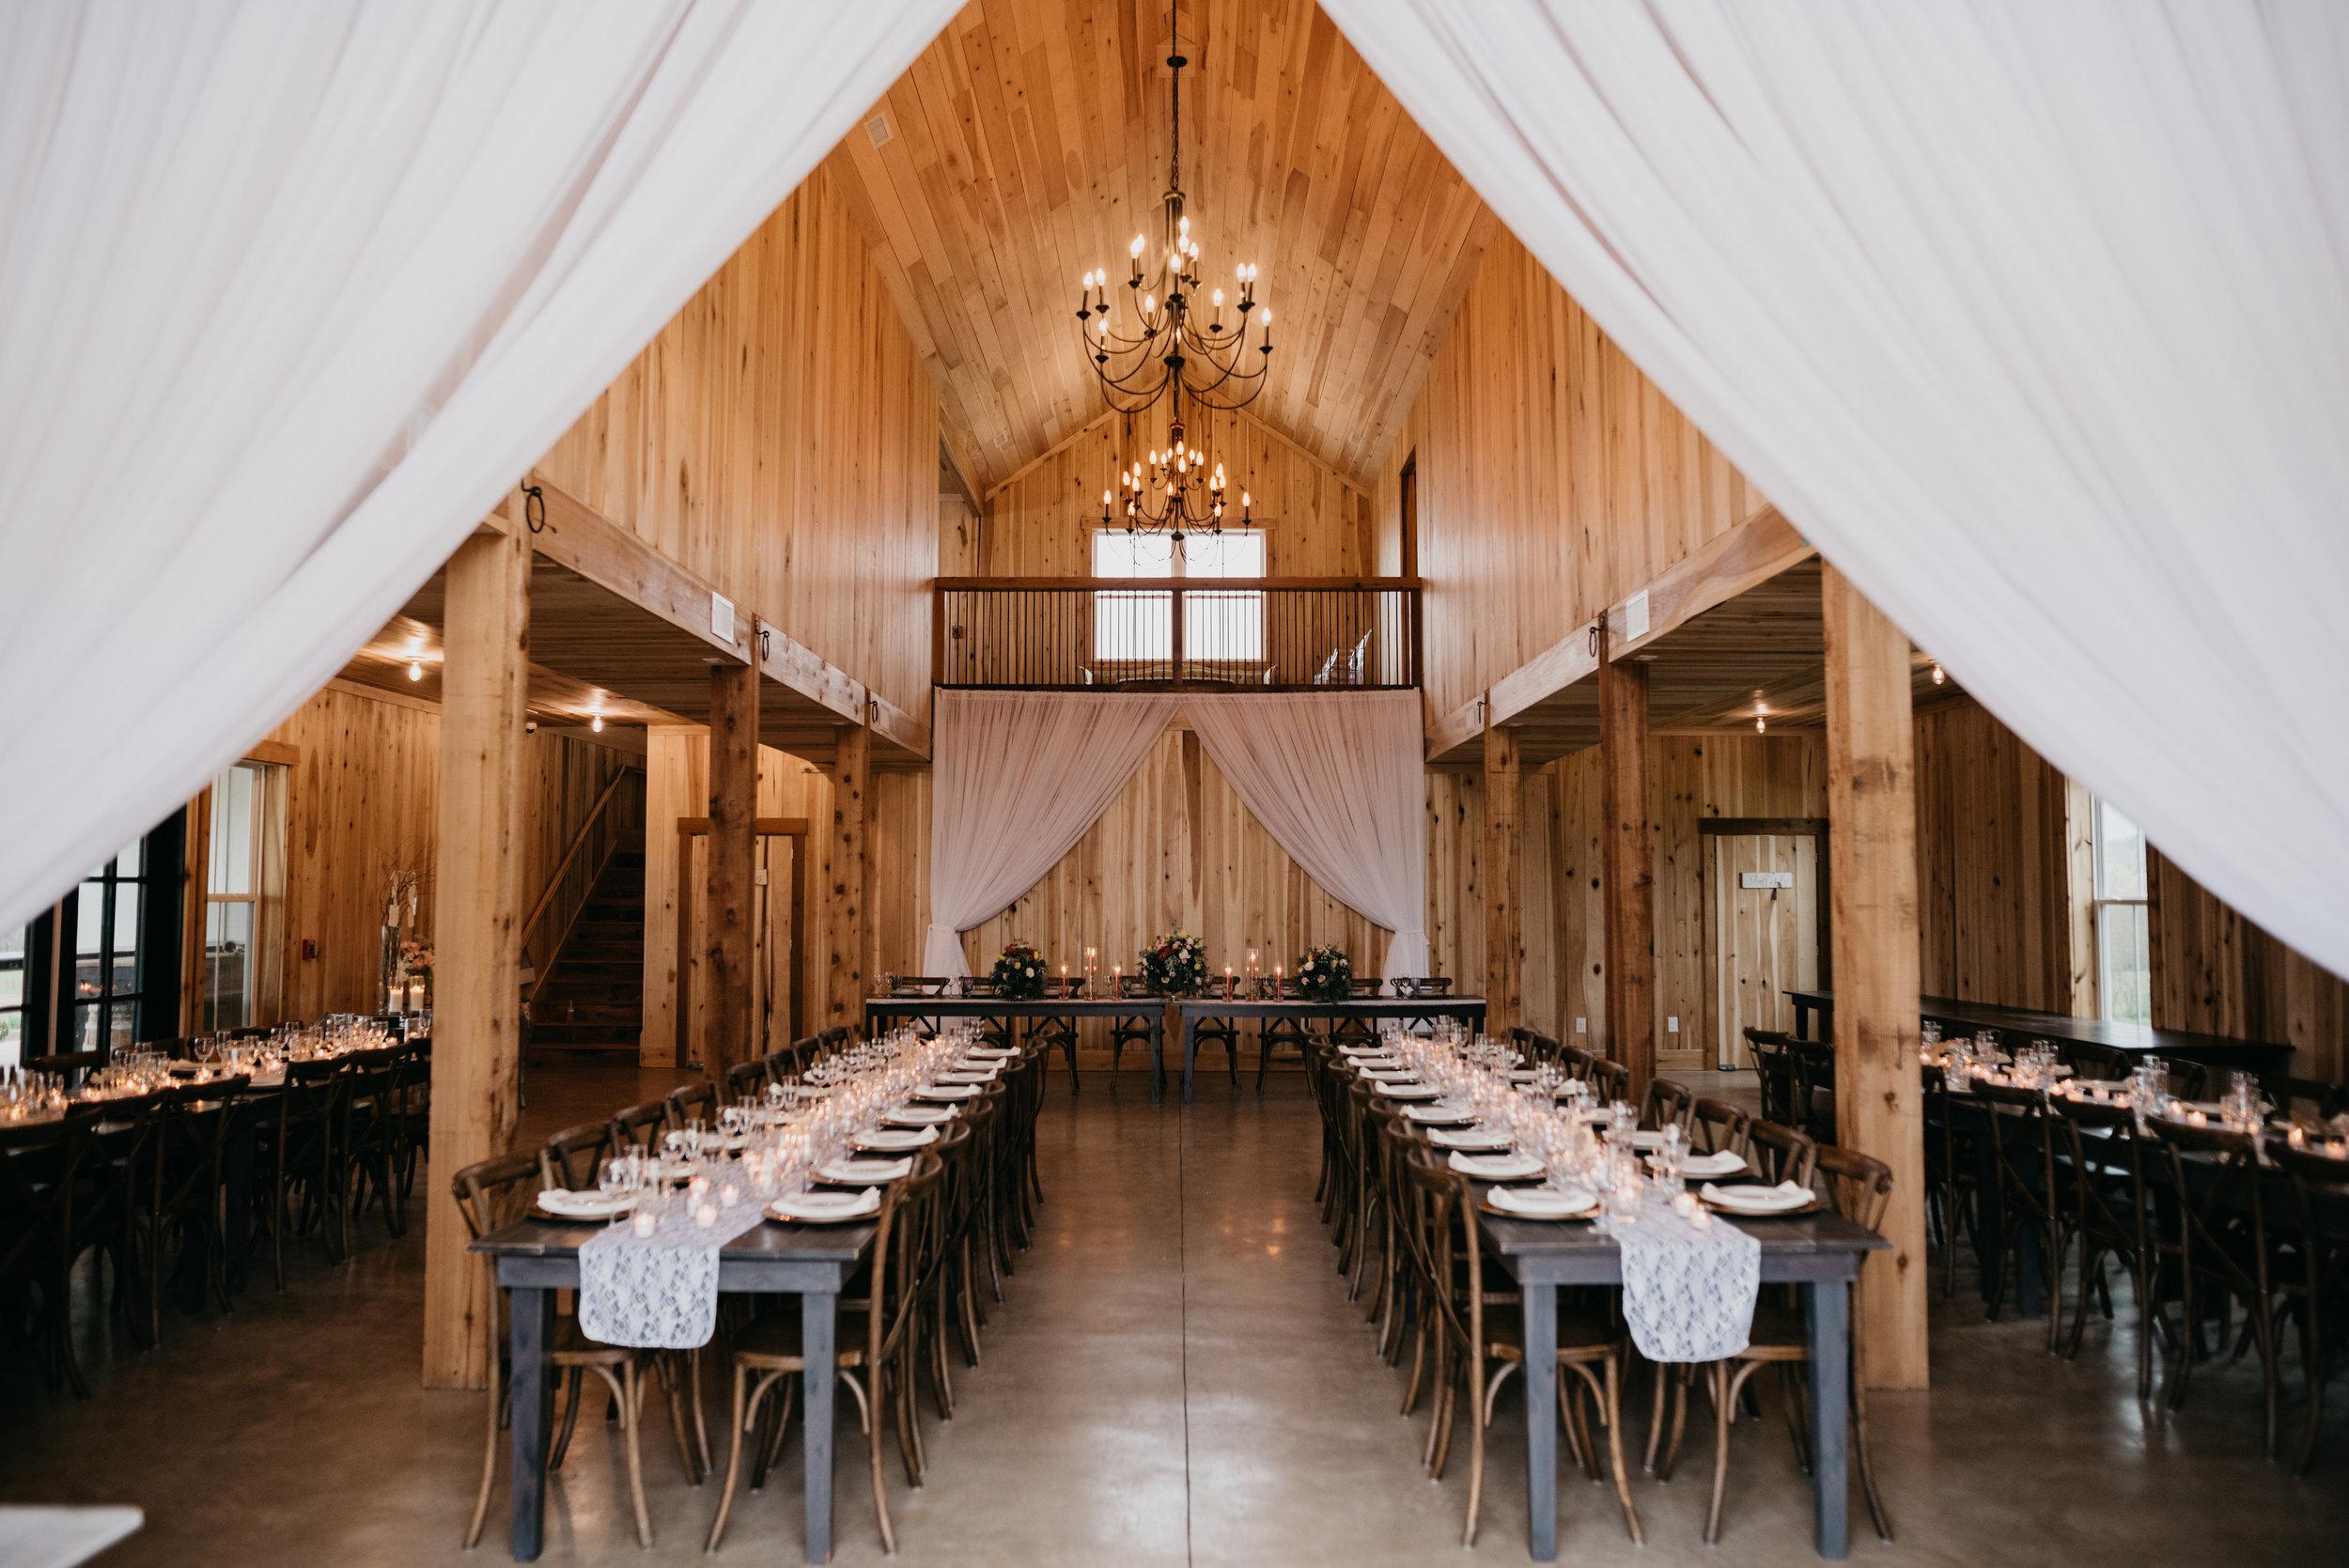 Allenbrooke-Farms-Nashville-Wedding-Photographers 39.jpg